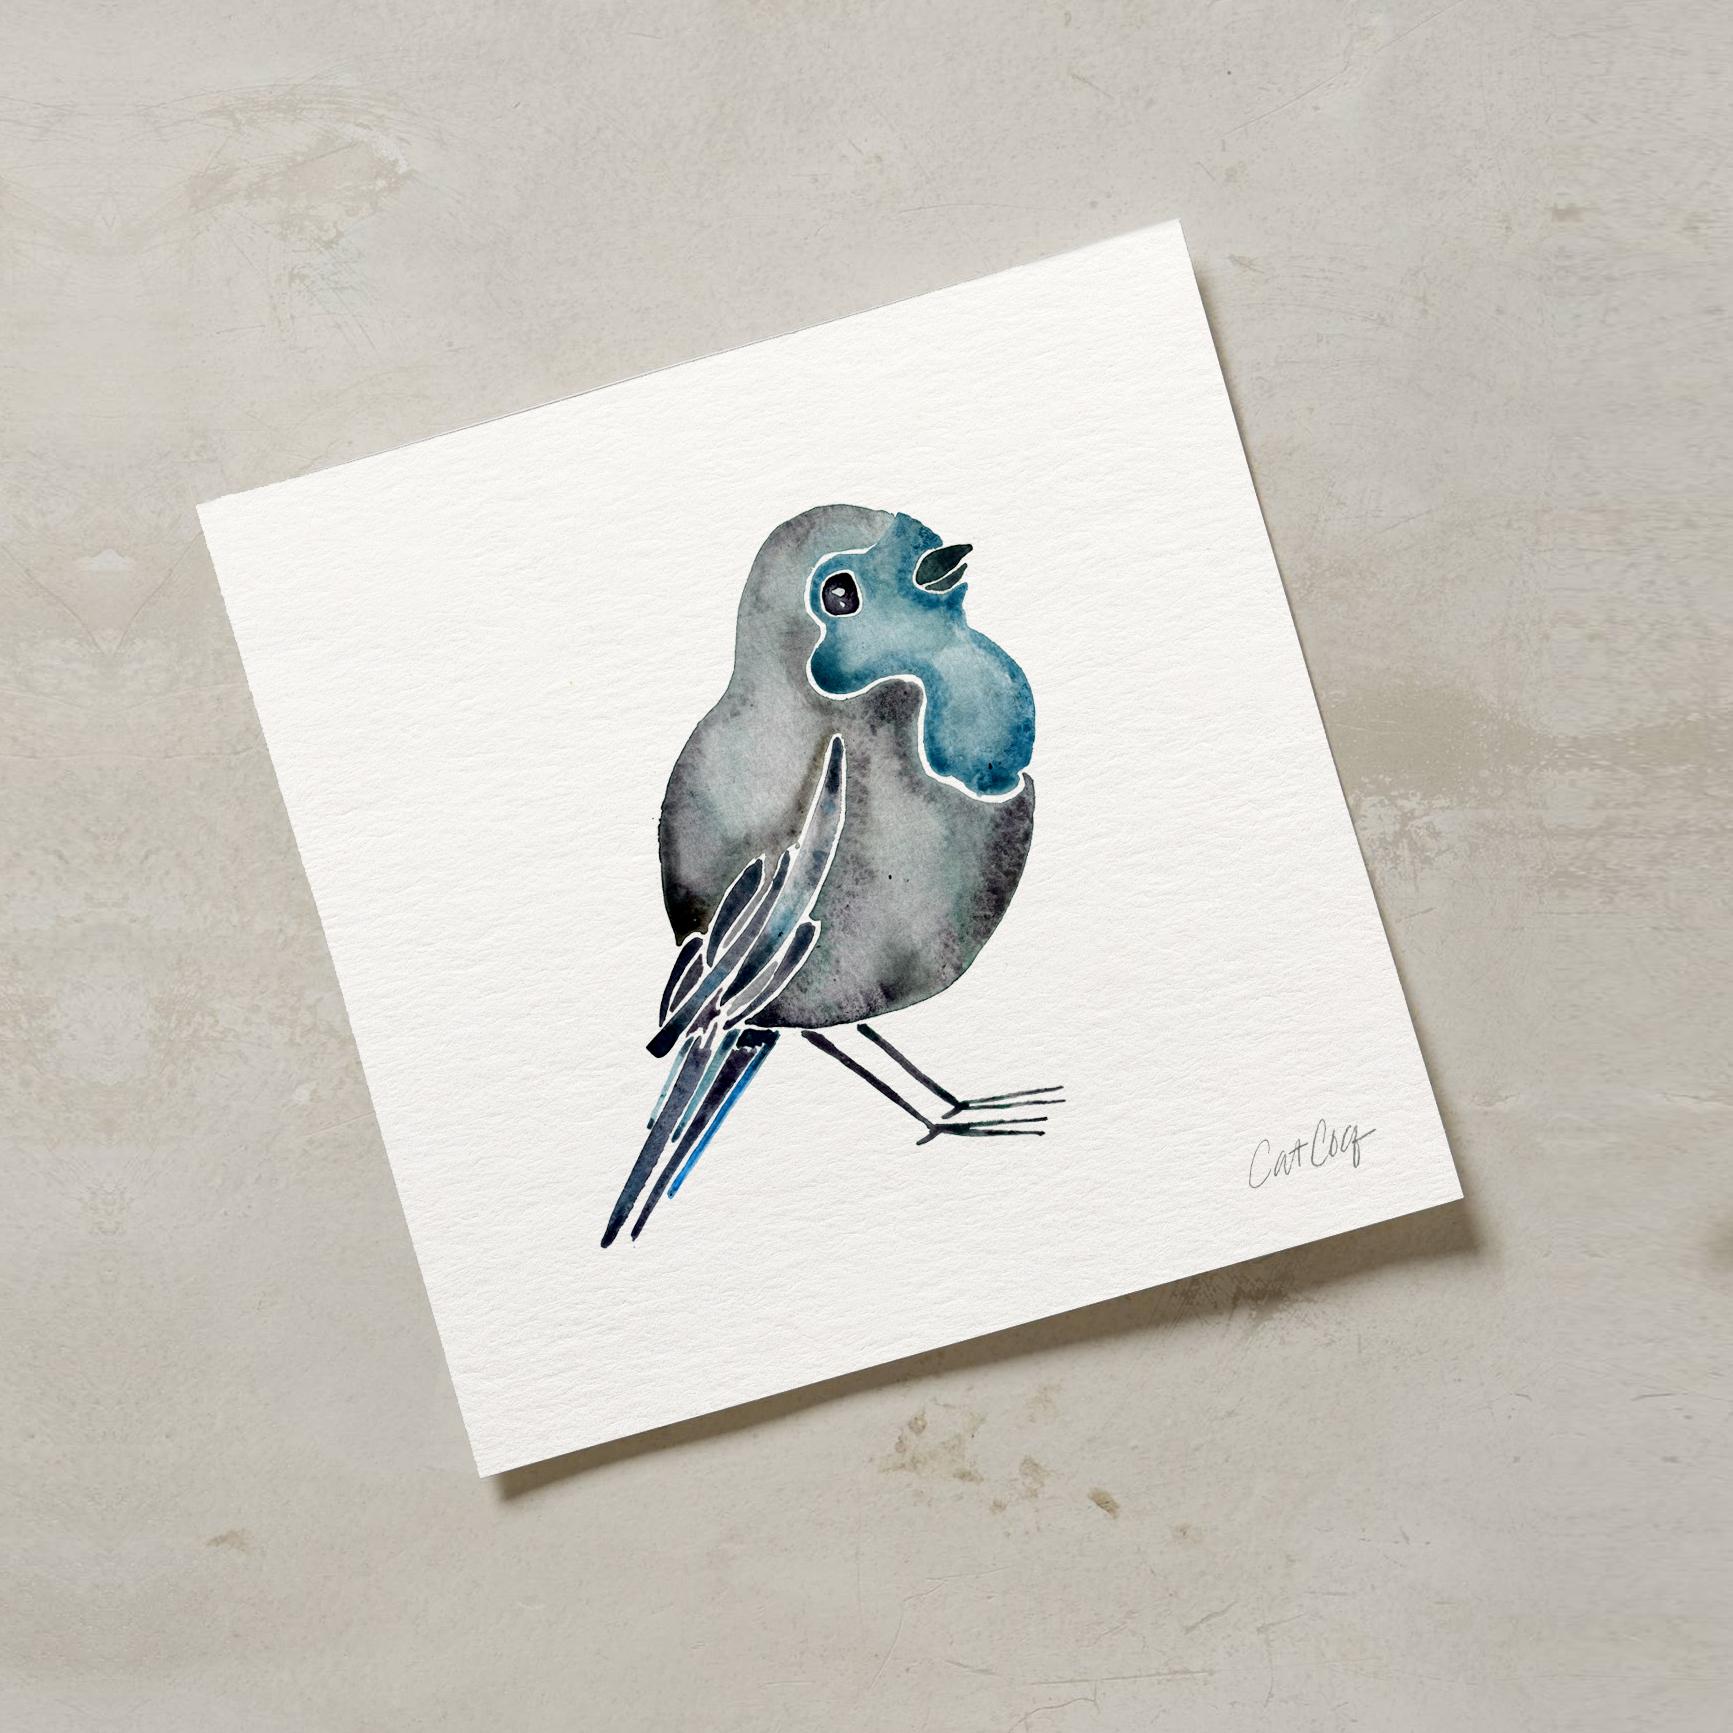 Blue Bird art print available  here .